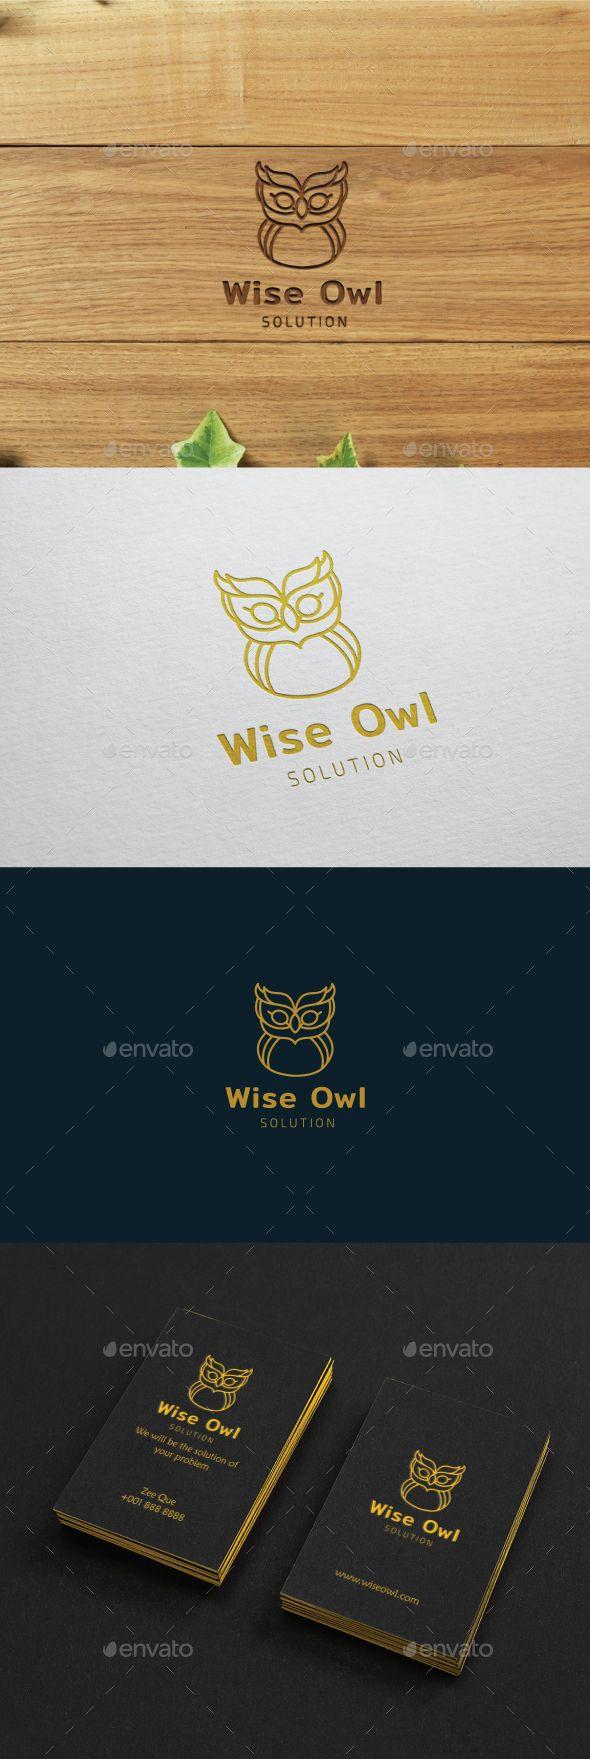 Wise Owl Logo - Animals Logo Templates download https://graphicriver.net/item/wise-owl-logo/20153349?ref=imanvector